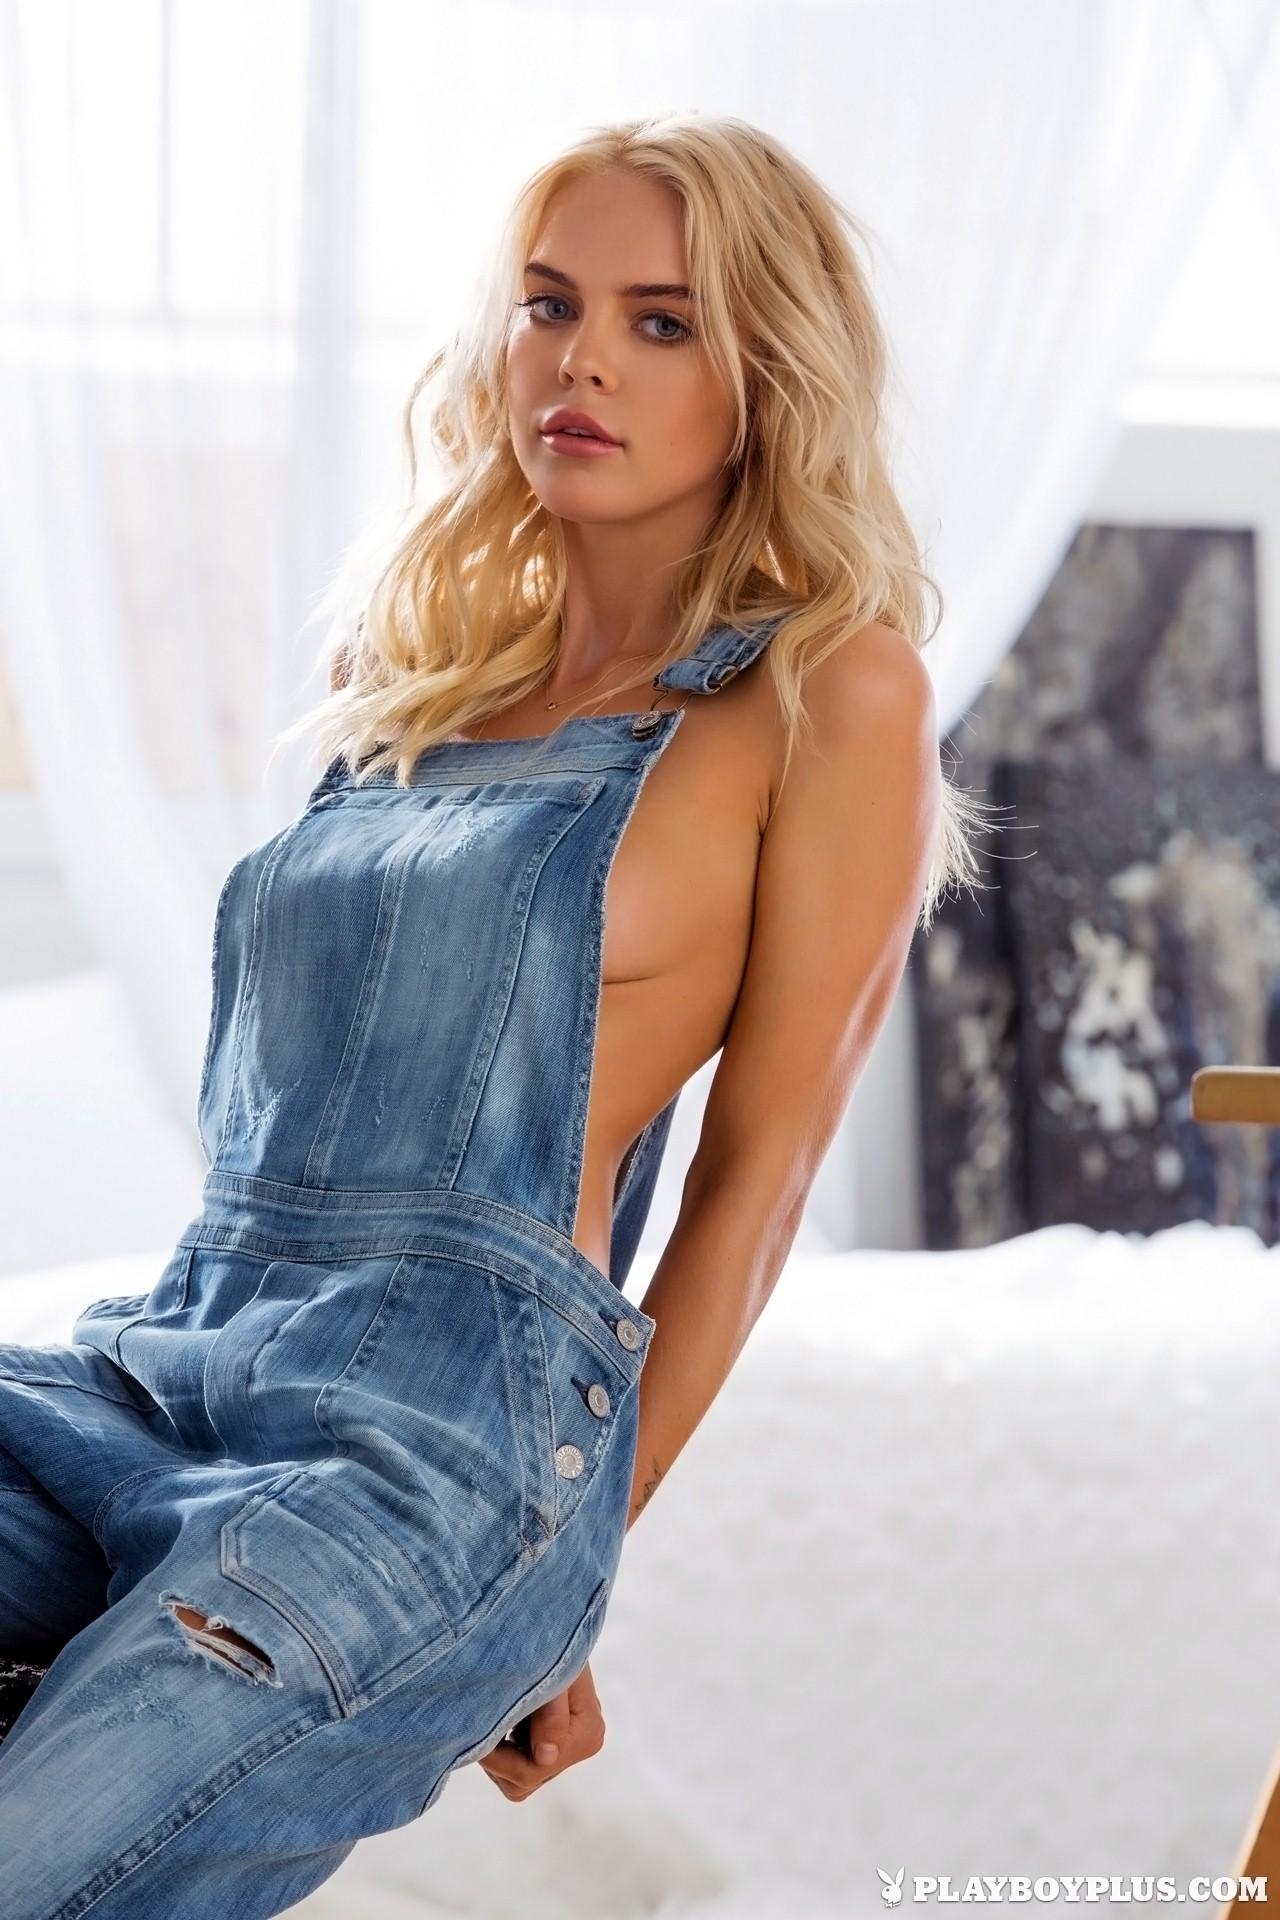 Rachel Harris Playboy Playmate November 2015 | Daily Girls @ Female Update